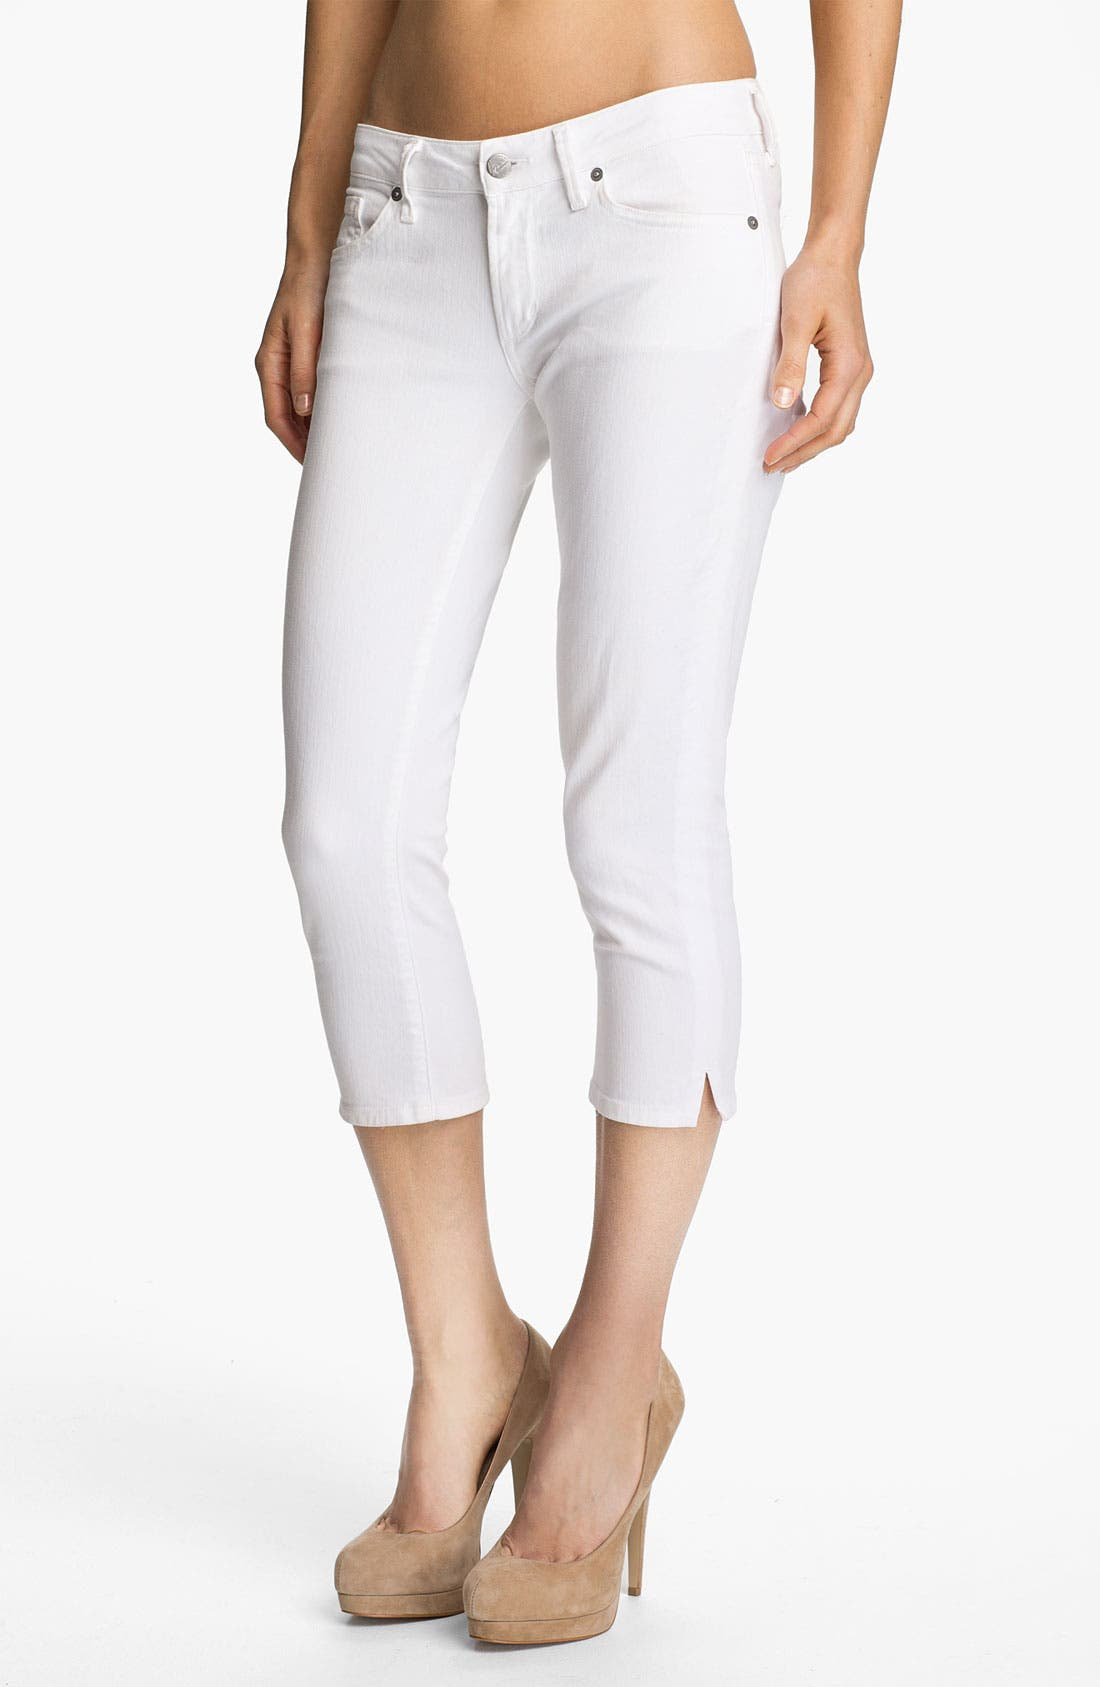 Alternate Image 1 Selected - Citizens of Humanity 'Racer' Crop Skinny Jeans (Santorini)